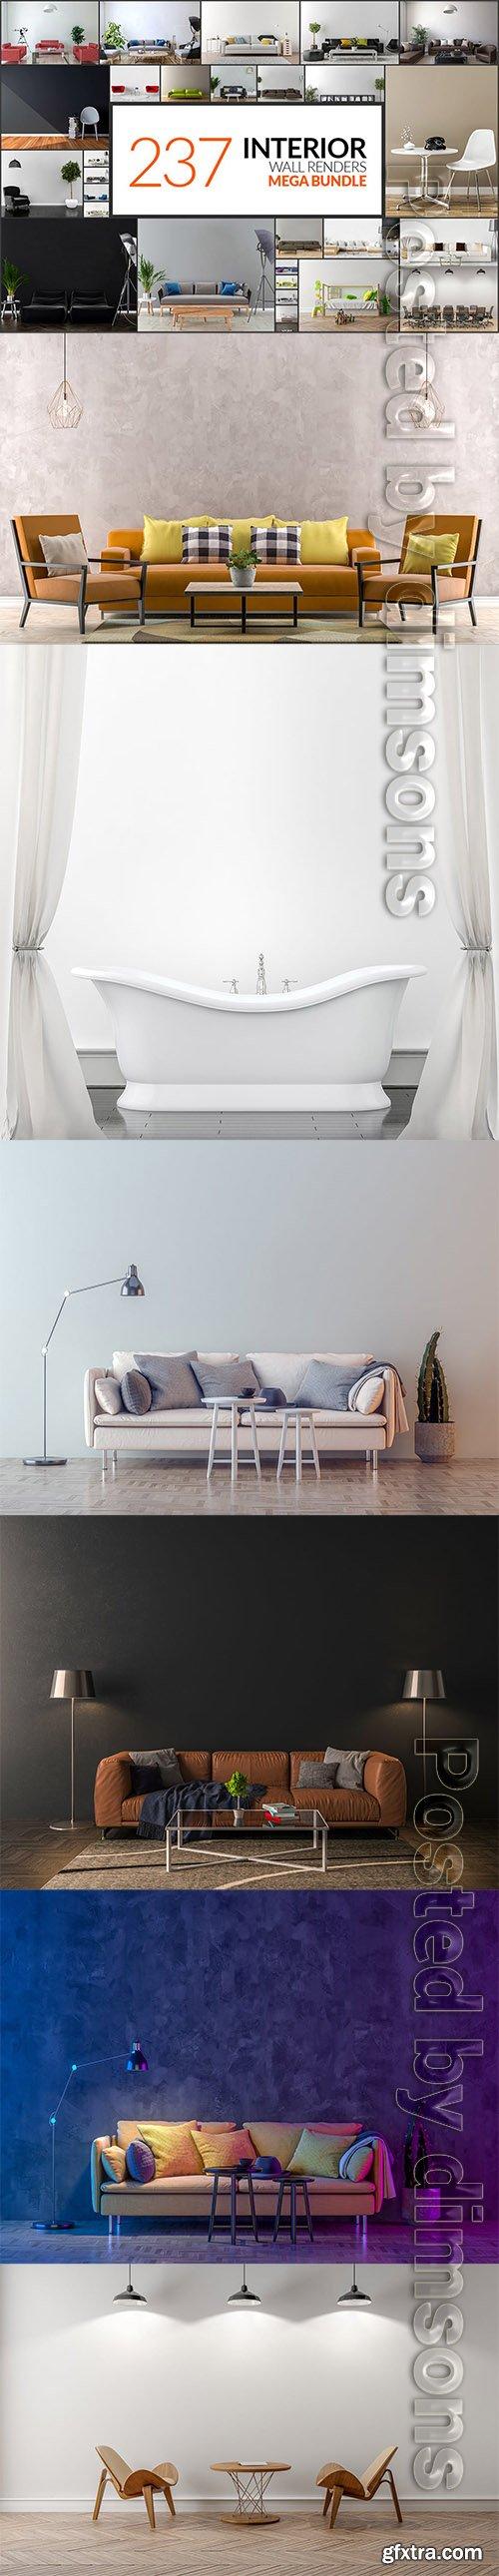 237 Interior Wall Renders - Mega Bundle